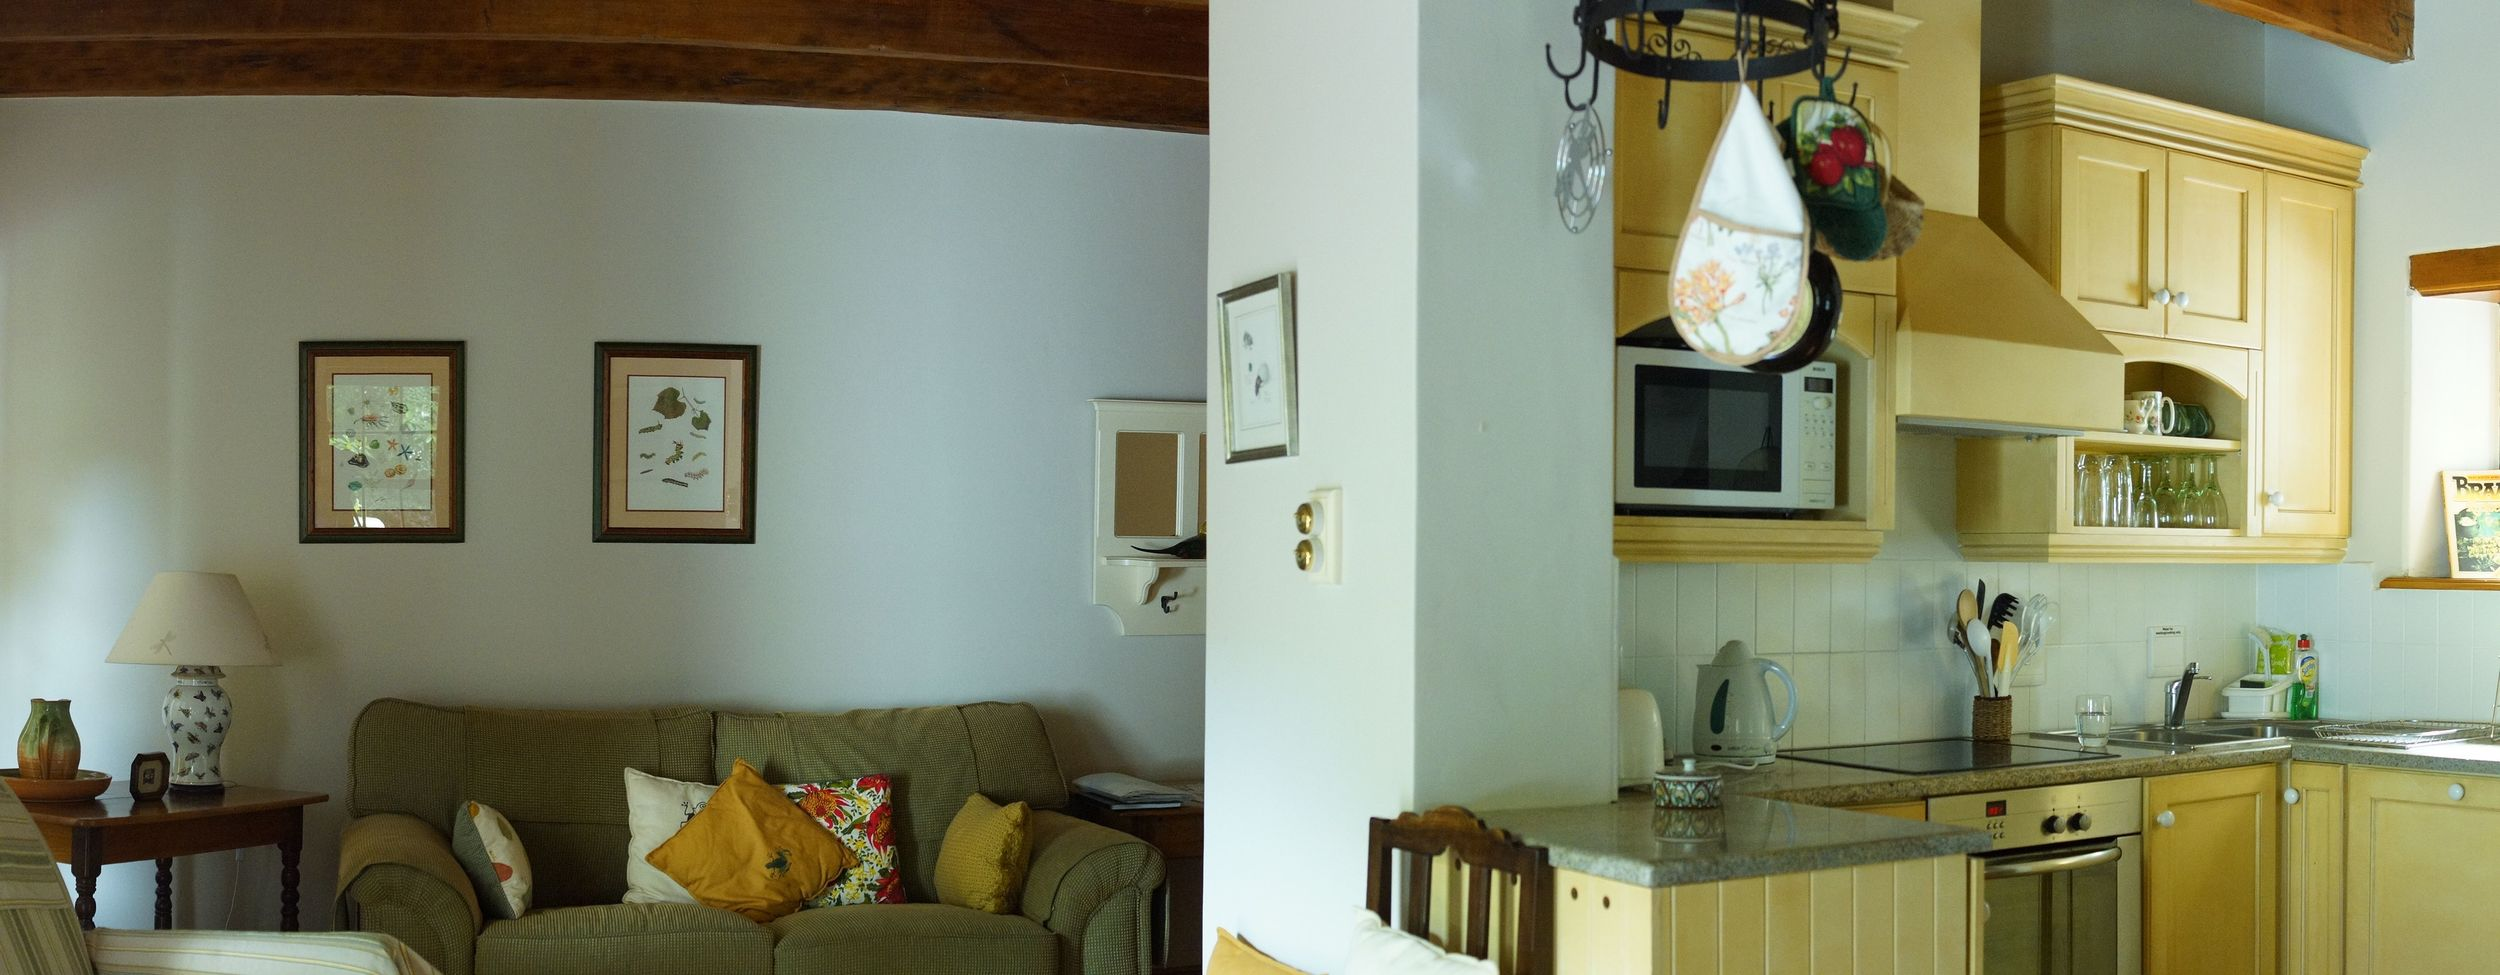 FT lounge kitchen pana.jpg